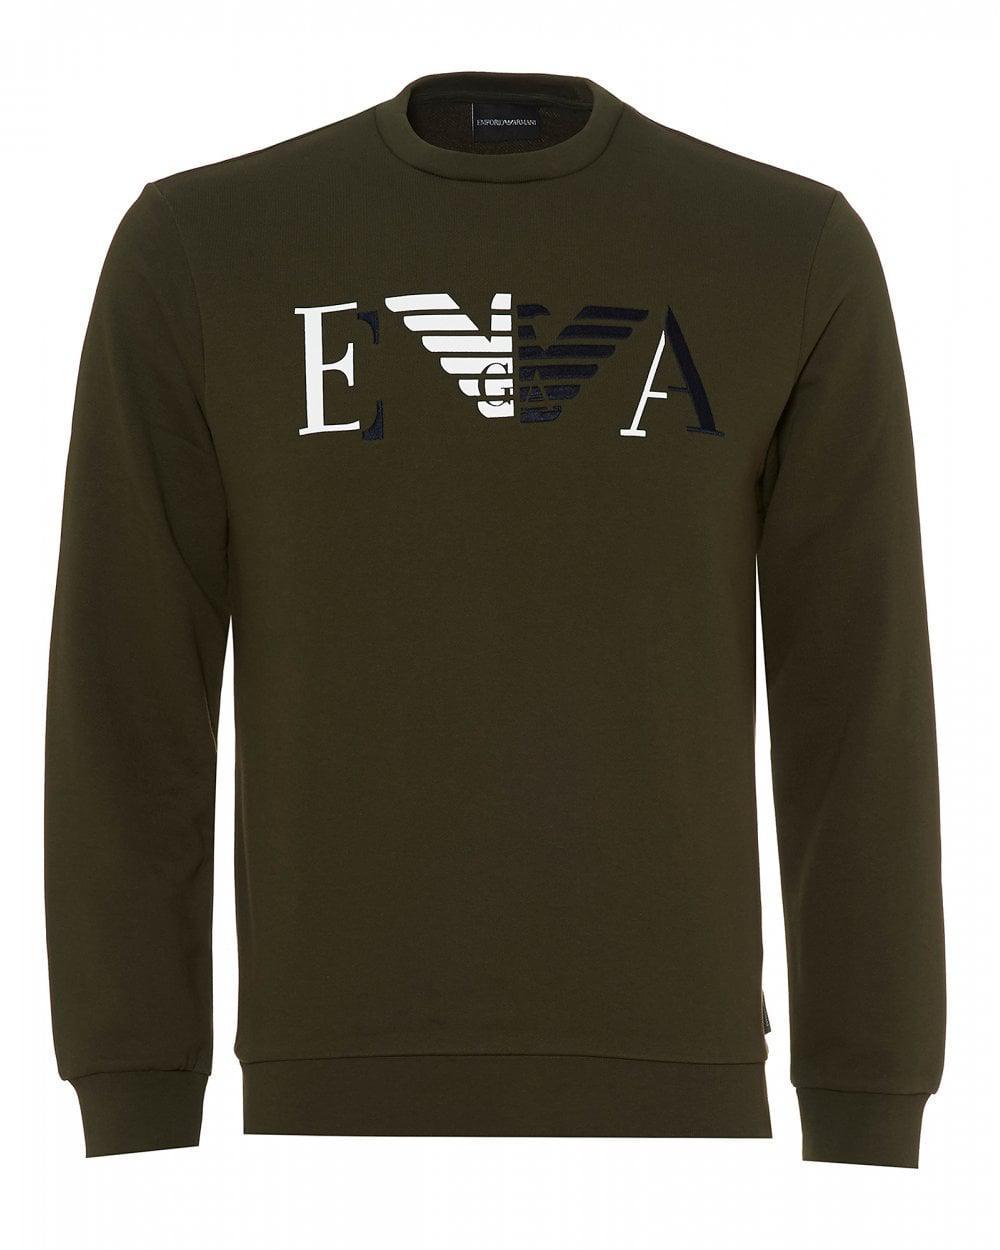 Emporio Armani Two Tone Logo Sweatshirt, Olive Green Sweat in Green ... 915a70de80